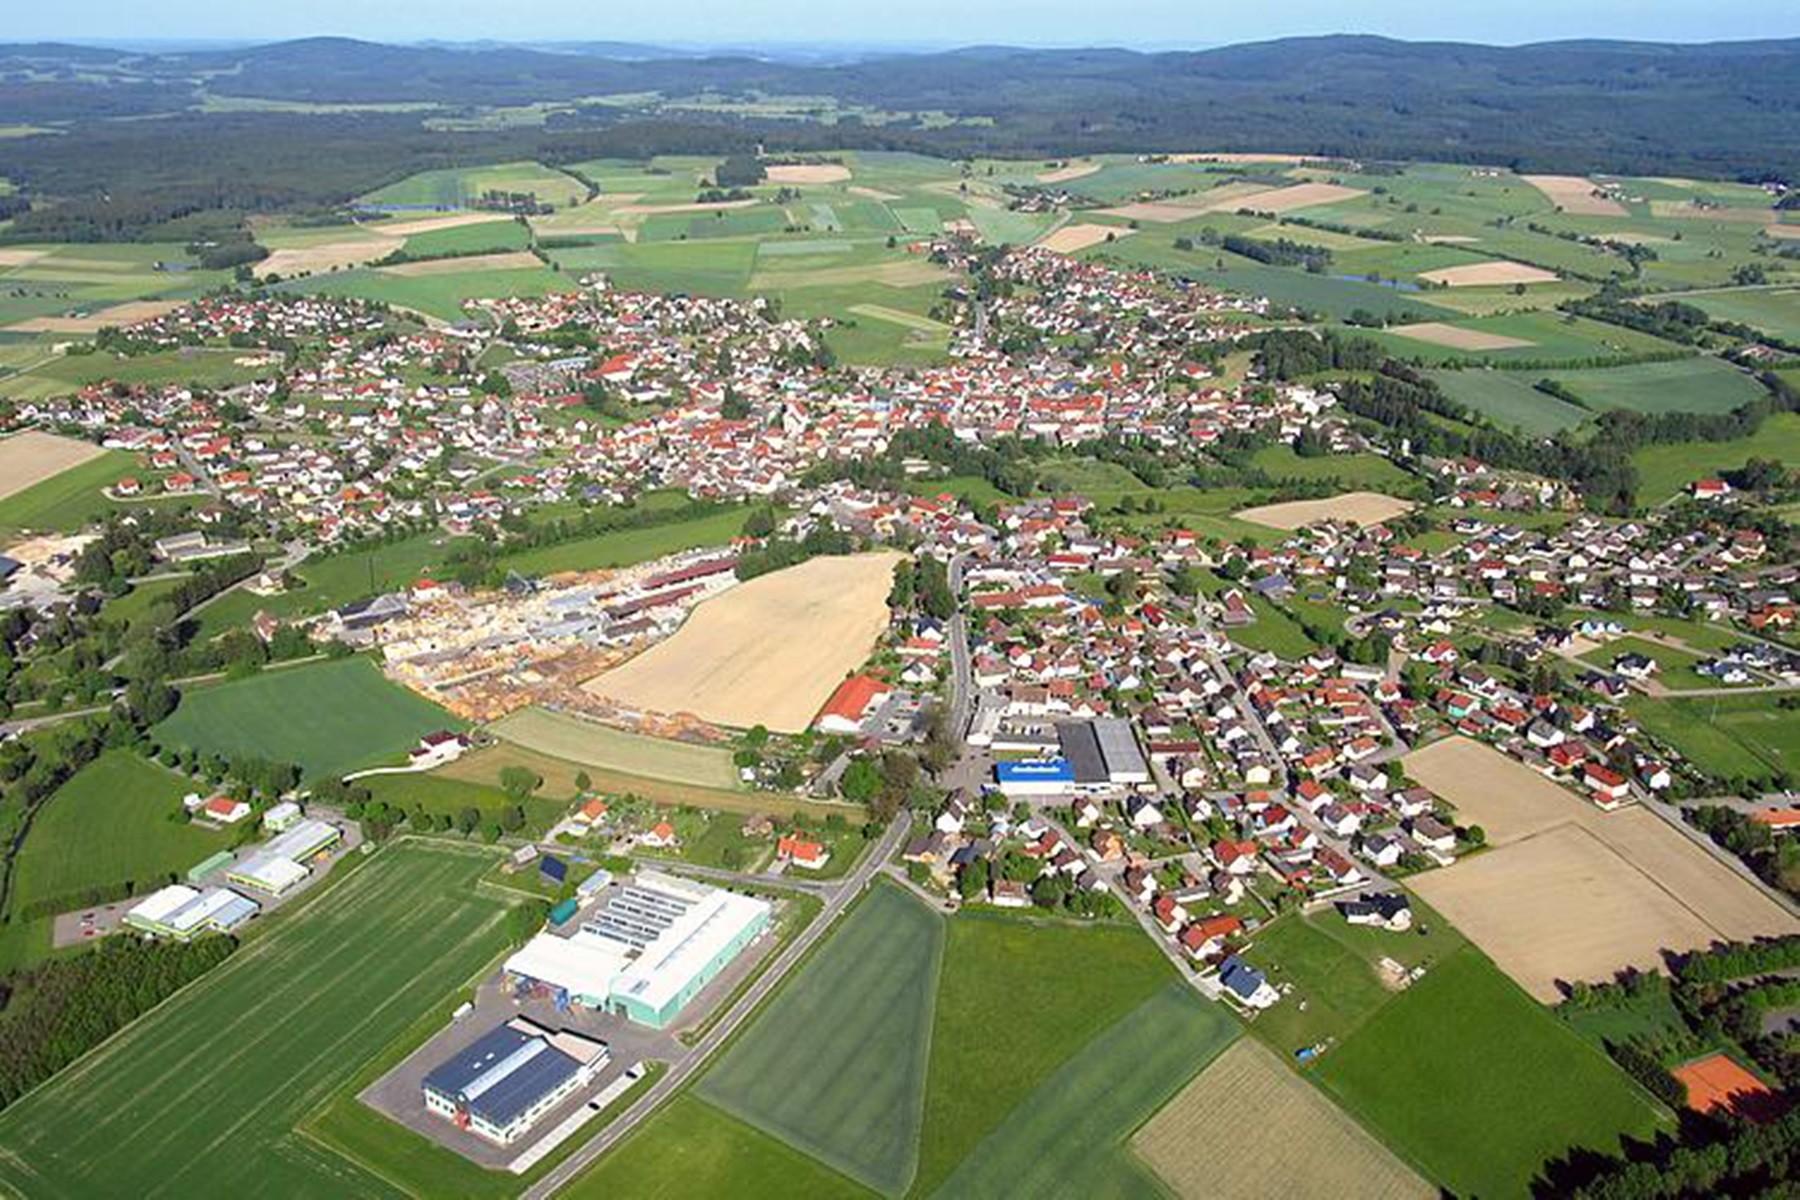 Umgebung-Luftbild